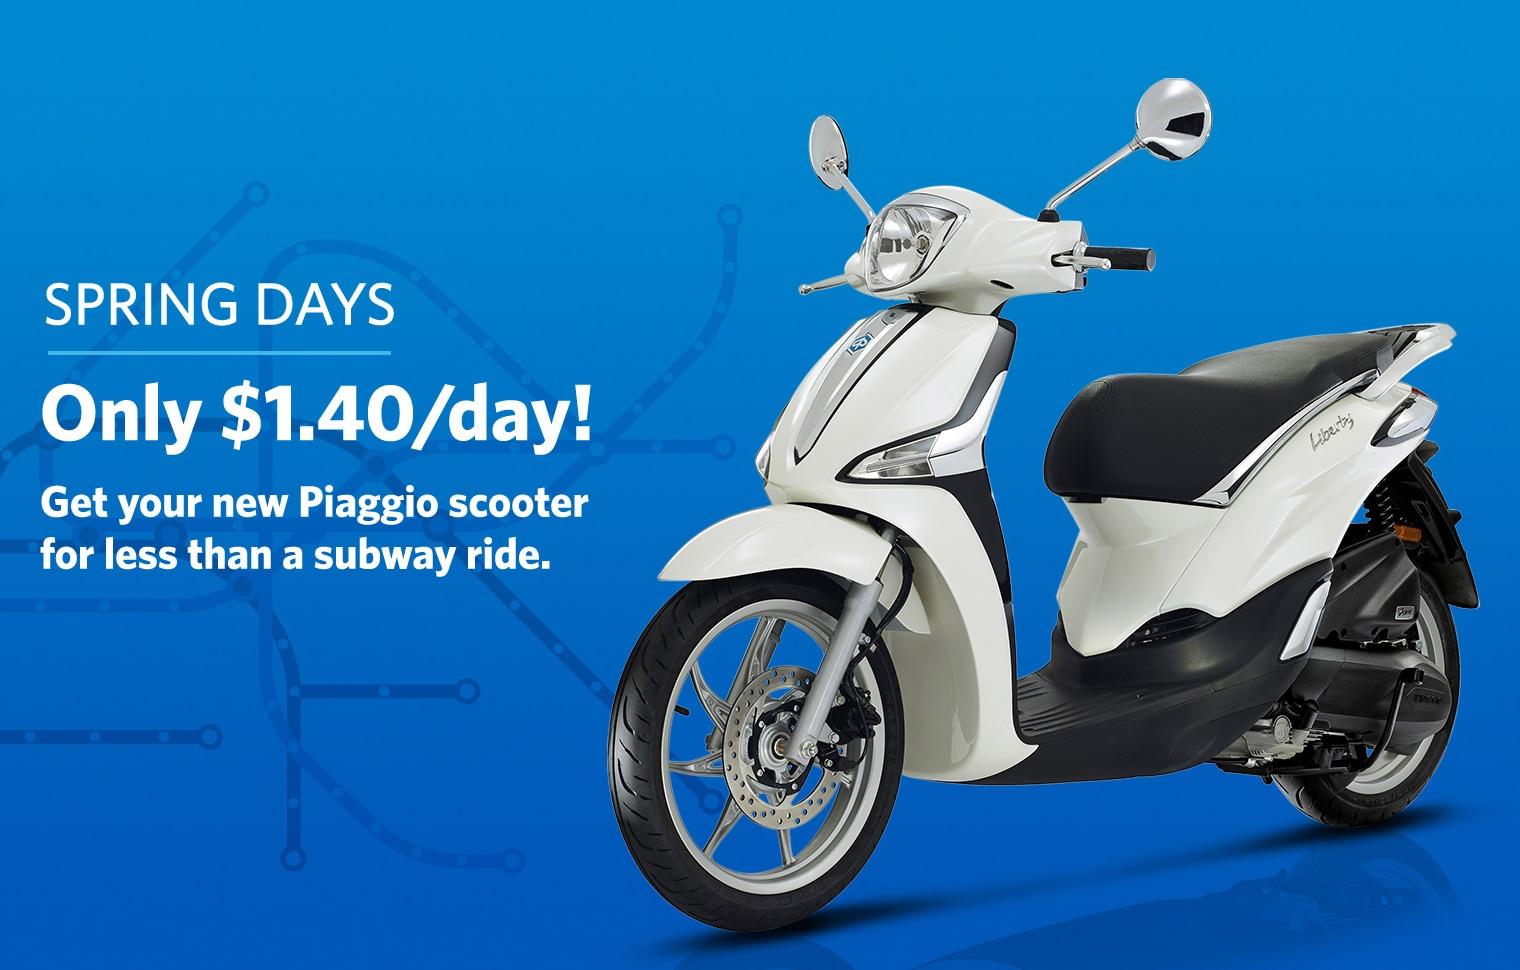 Piaggio The Official Website Piaggiocom